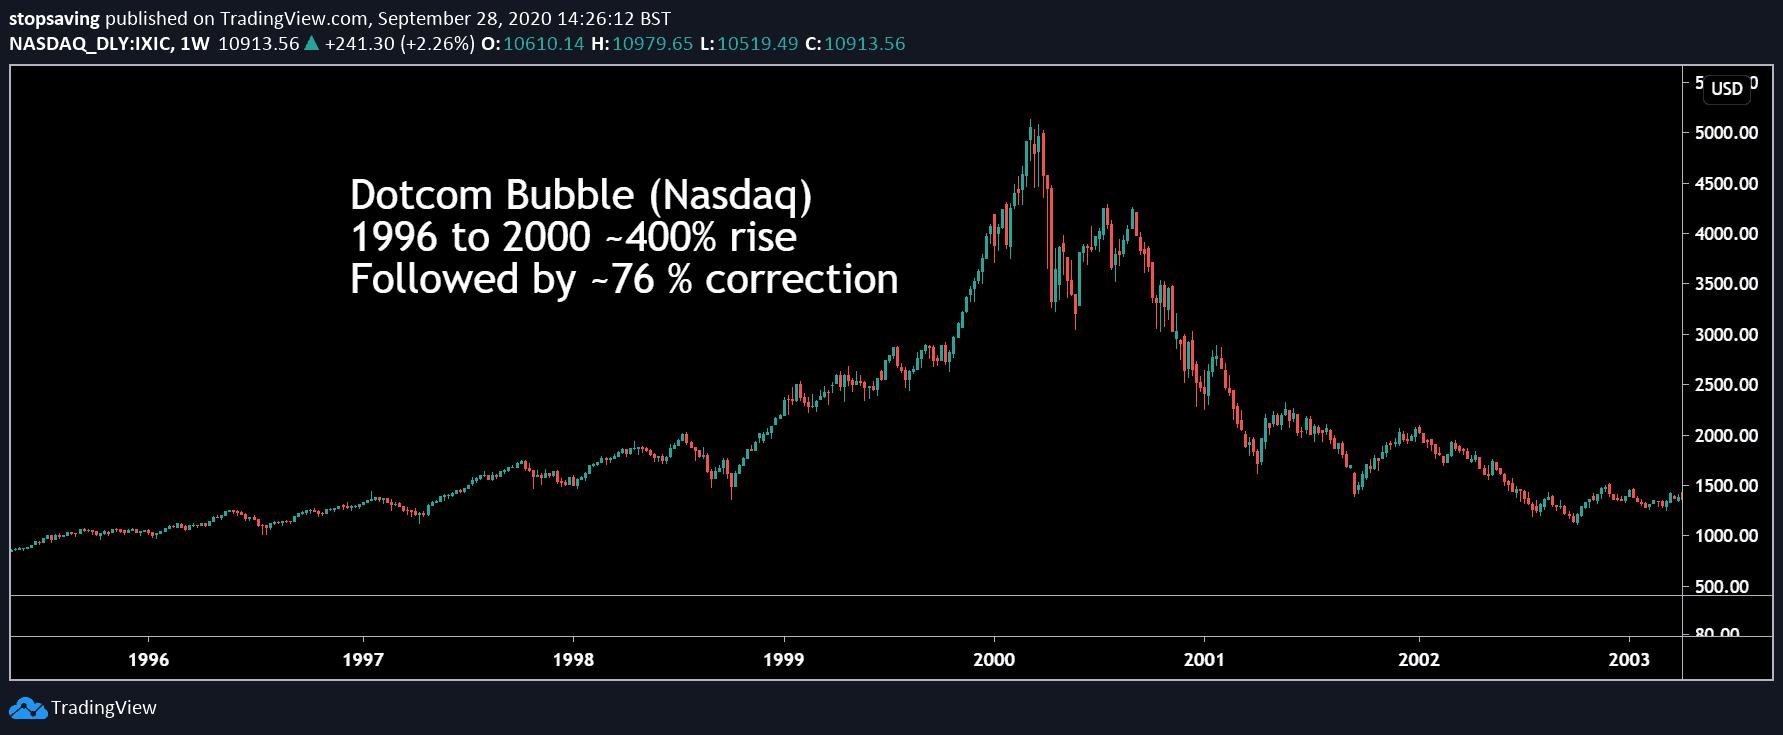 chart showing Nasdaq dotcom crash